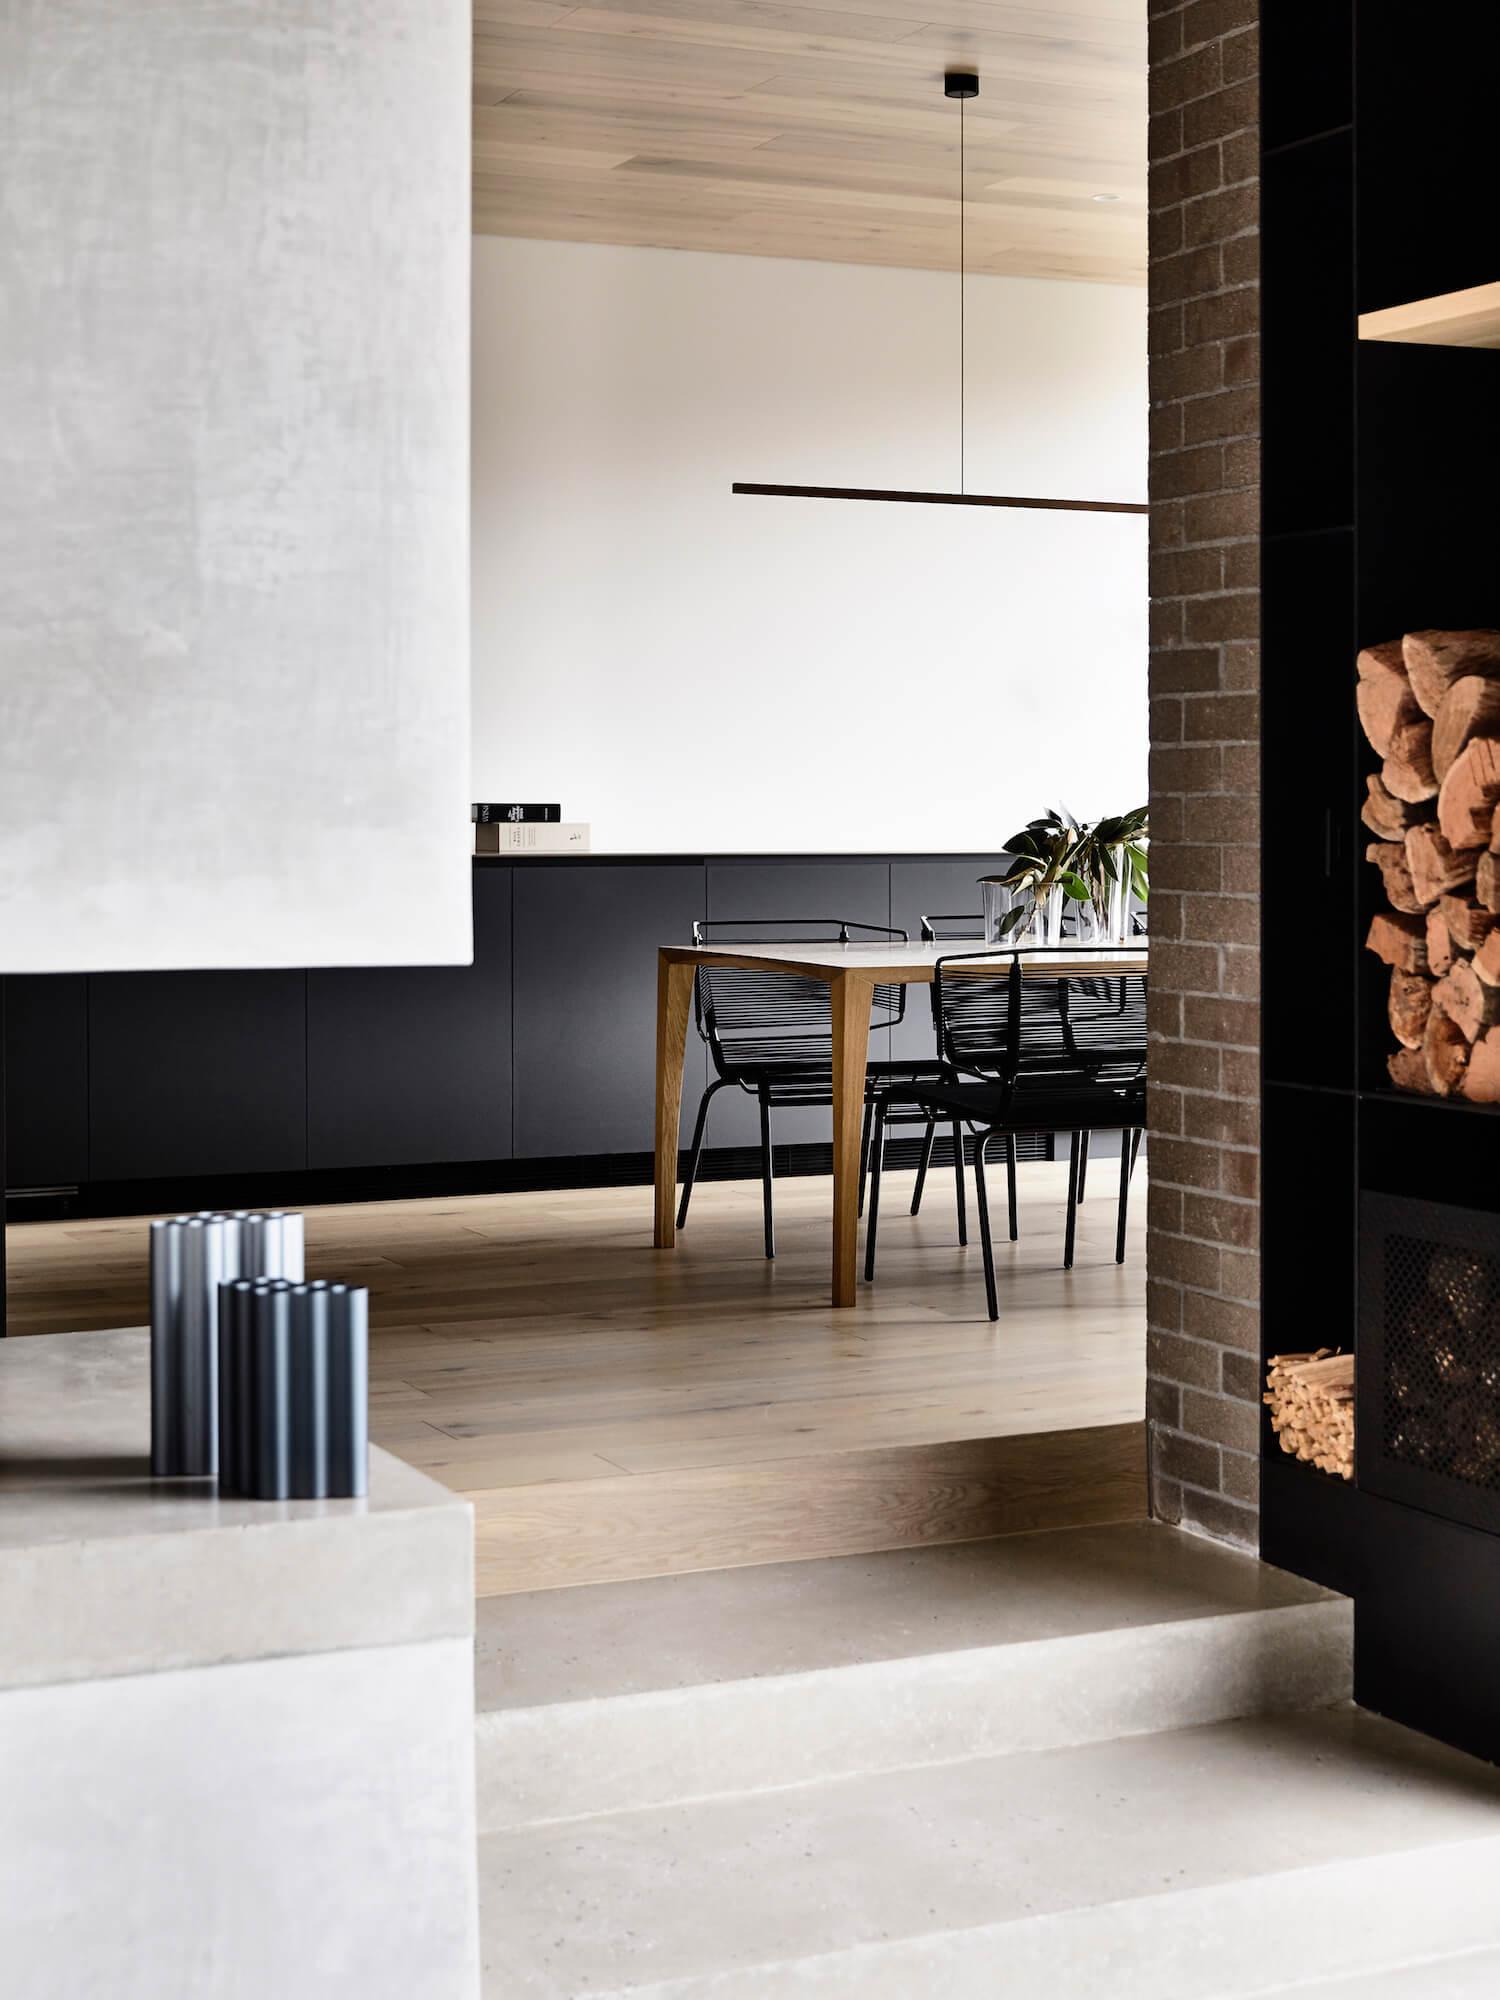 est living york street residence jackson clements burrows architects brickworks 9